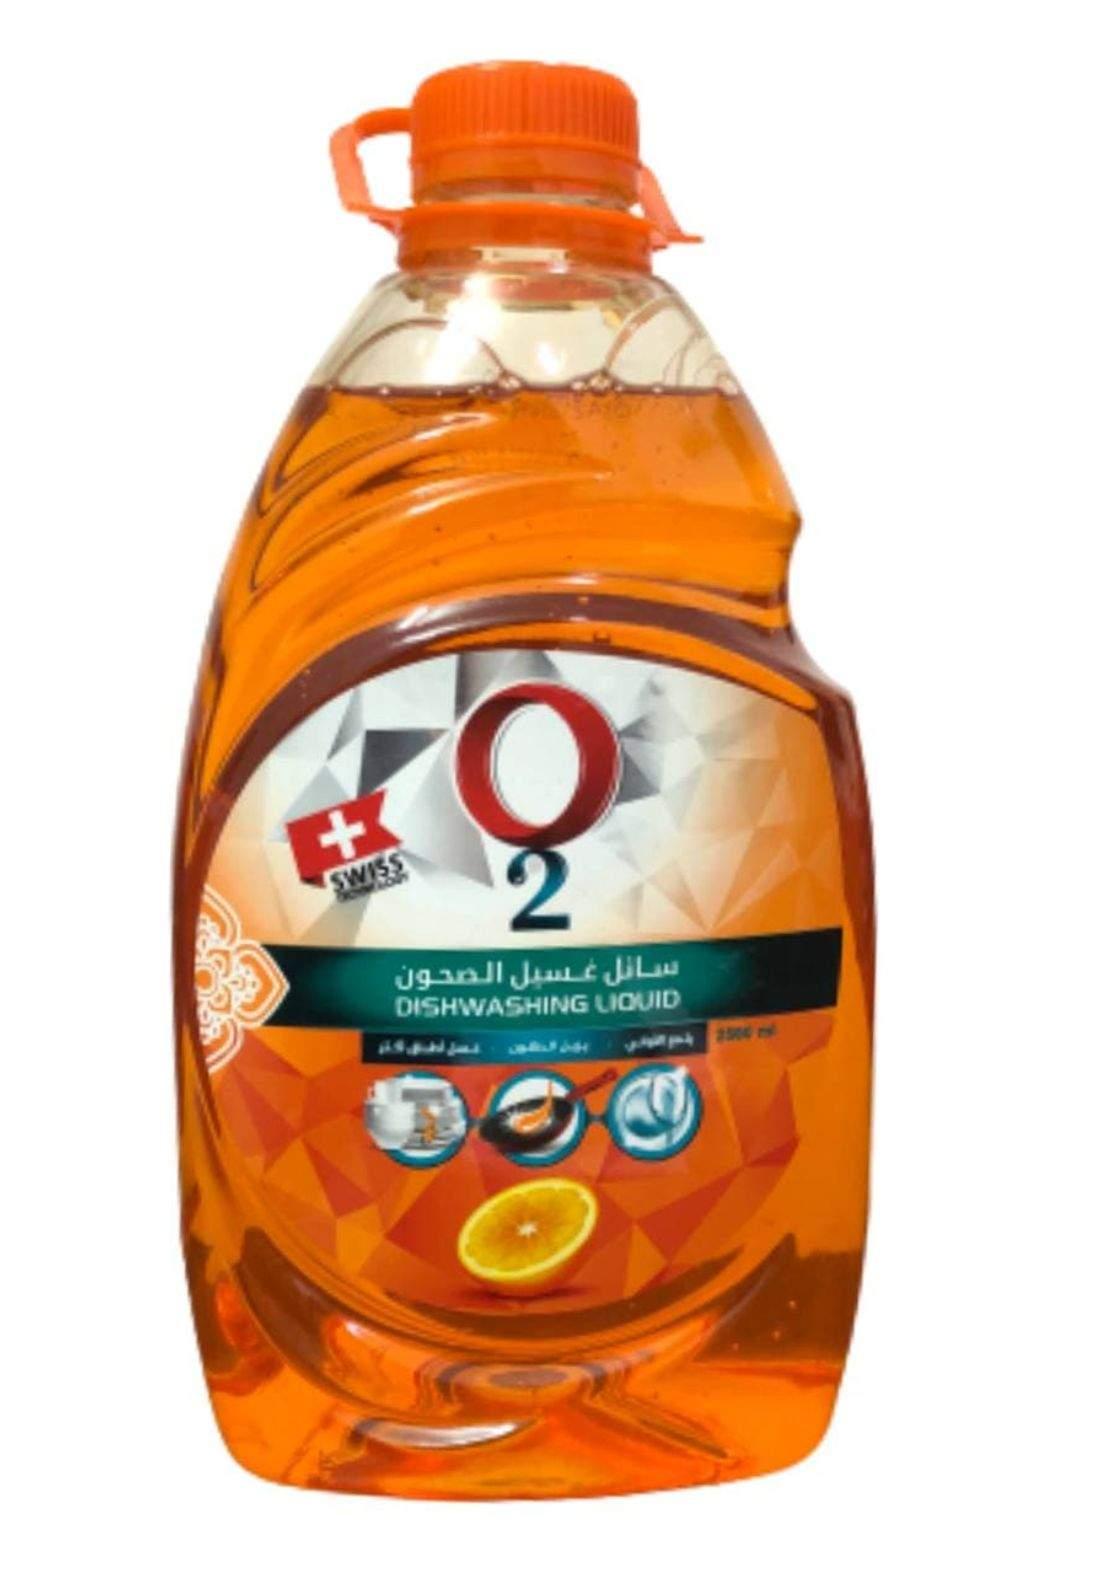 O2 Dishwashing liquid2500mlاوتو  سائل التنظيف الاواني